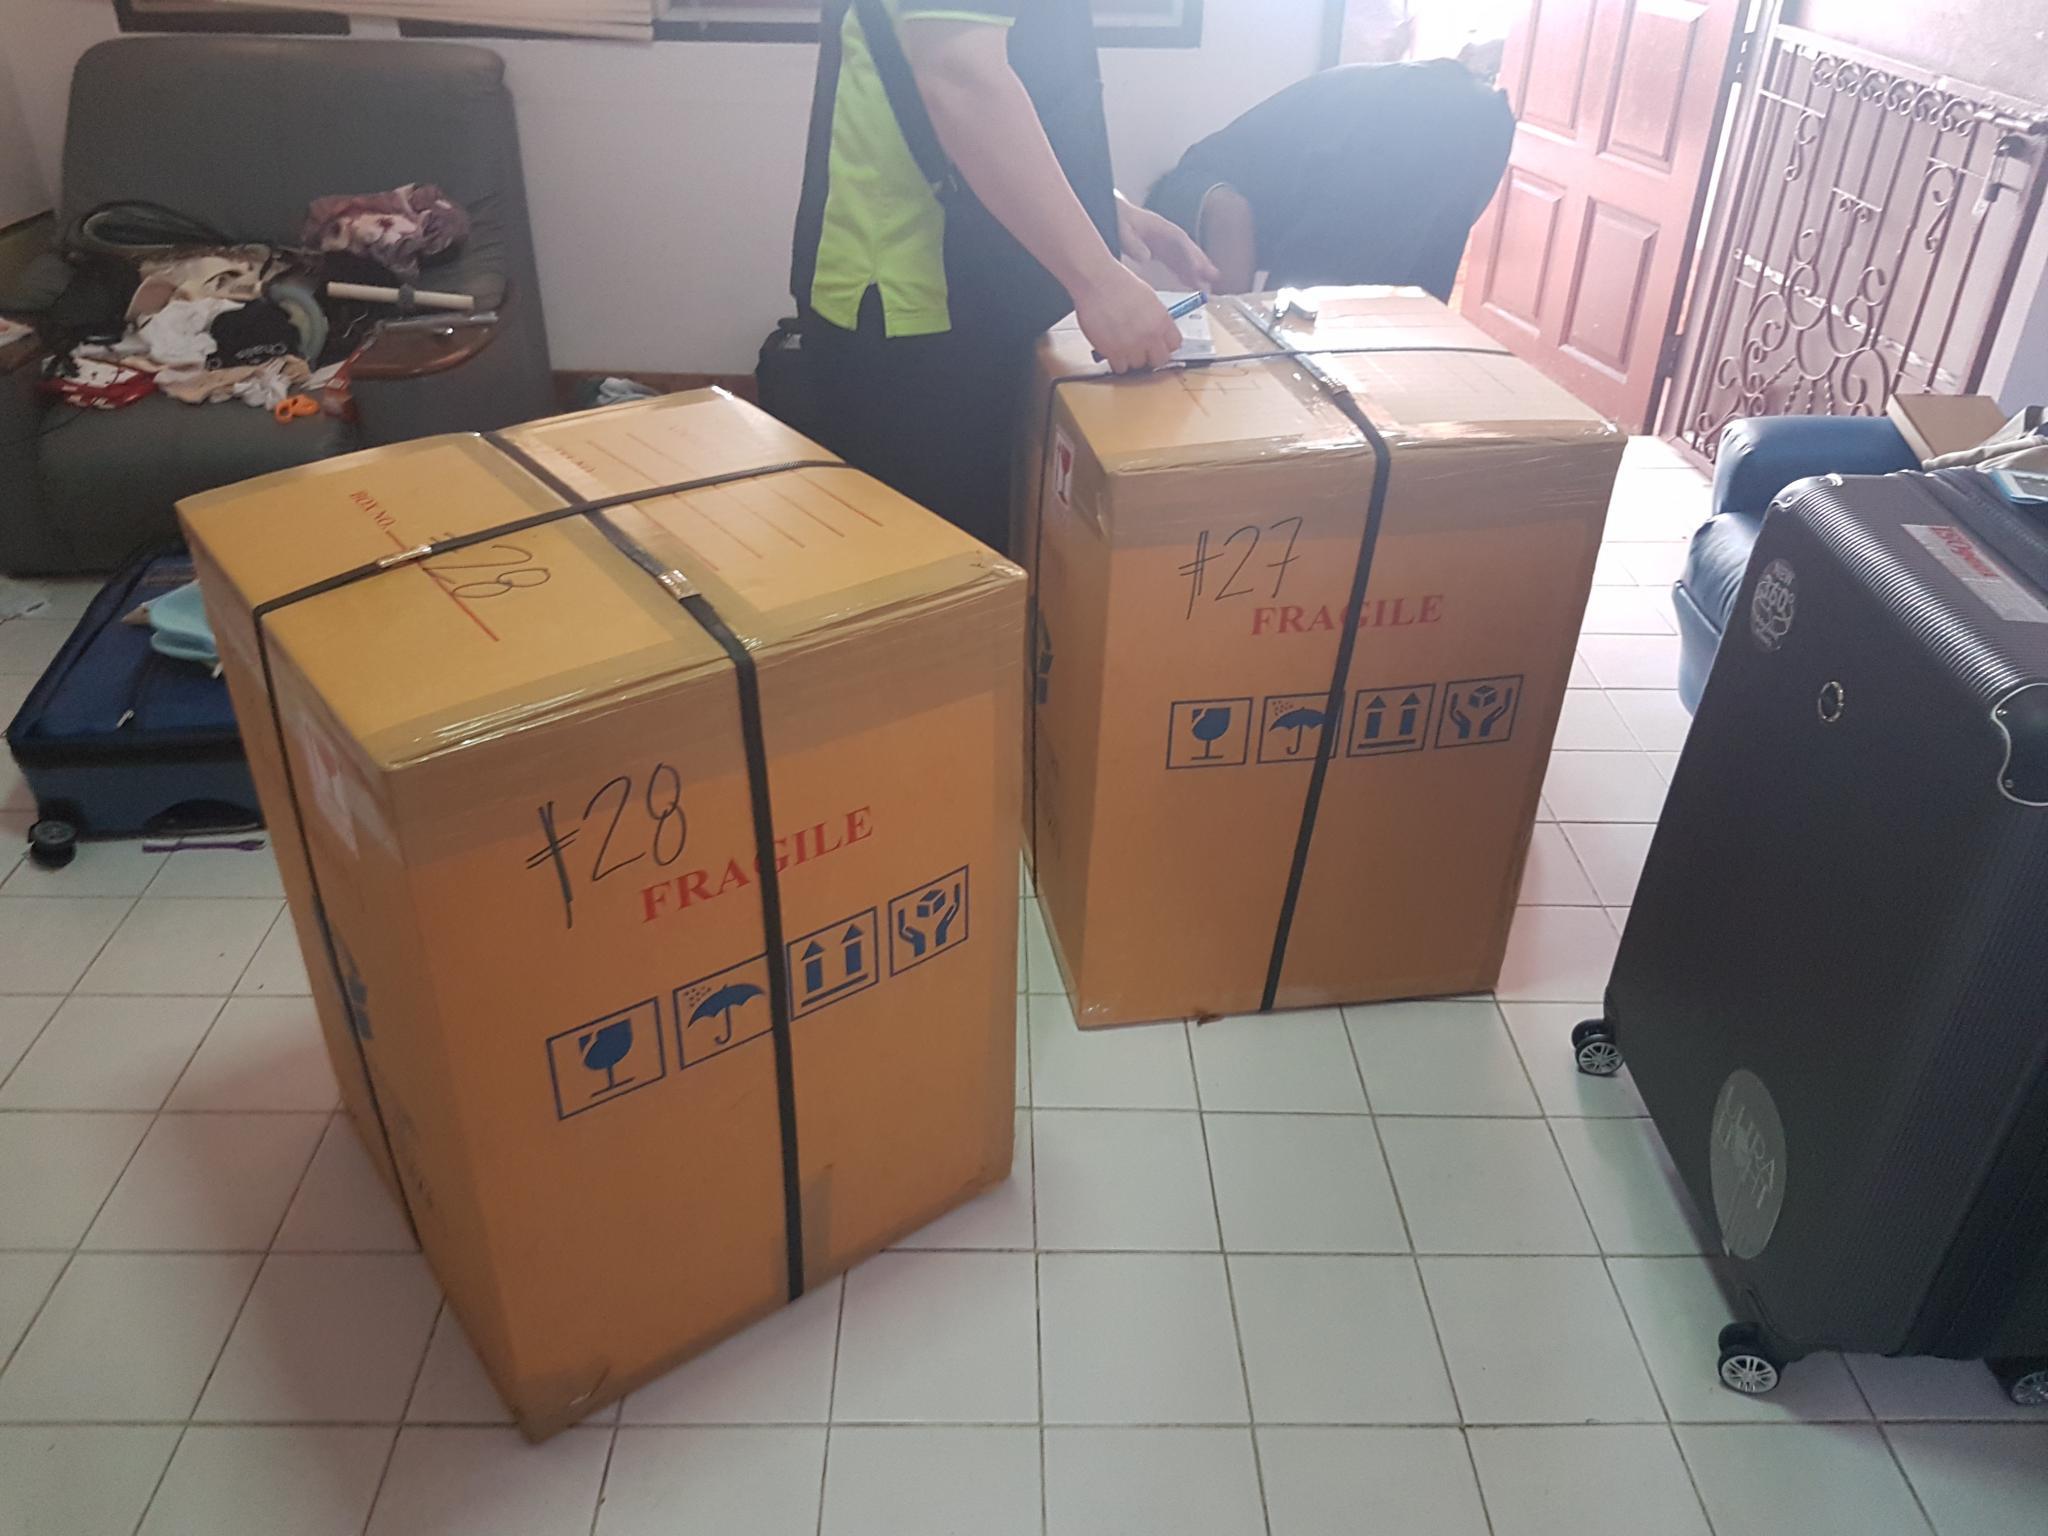 Topper in Bacolod-20200303_135056_001-jpg